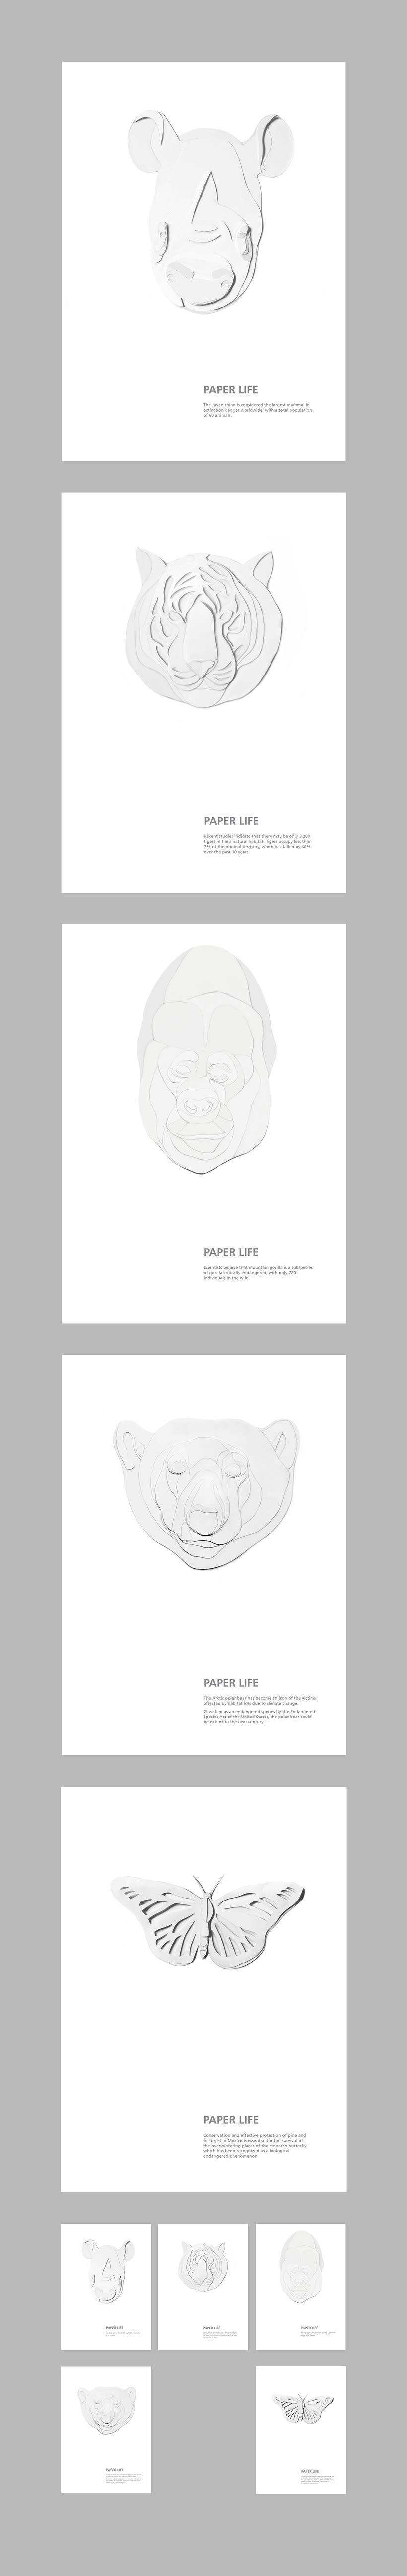 Paper life -1